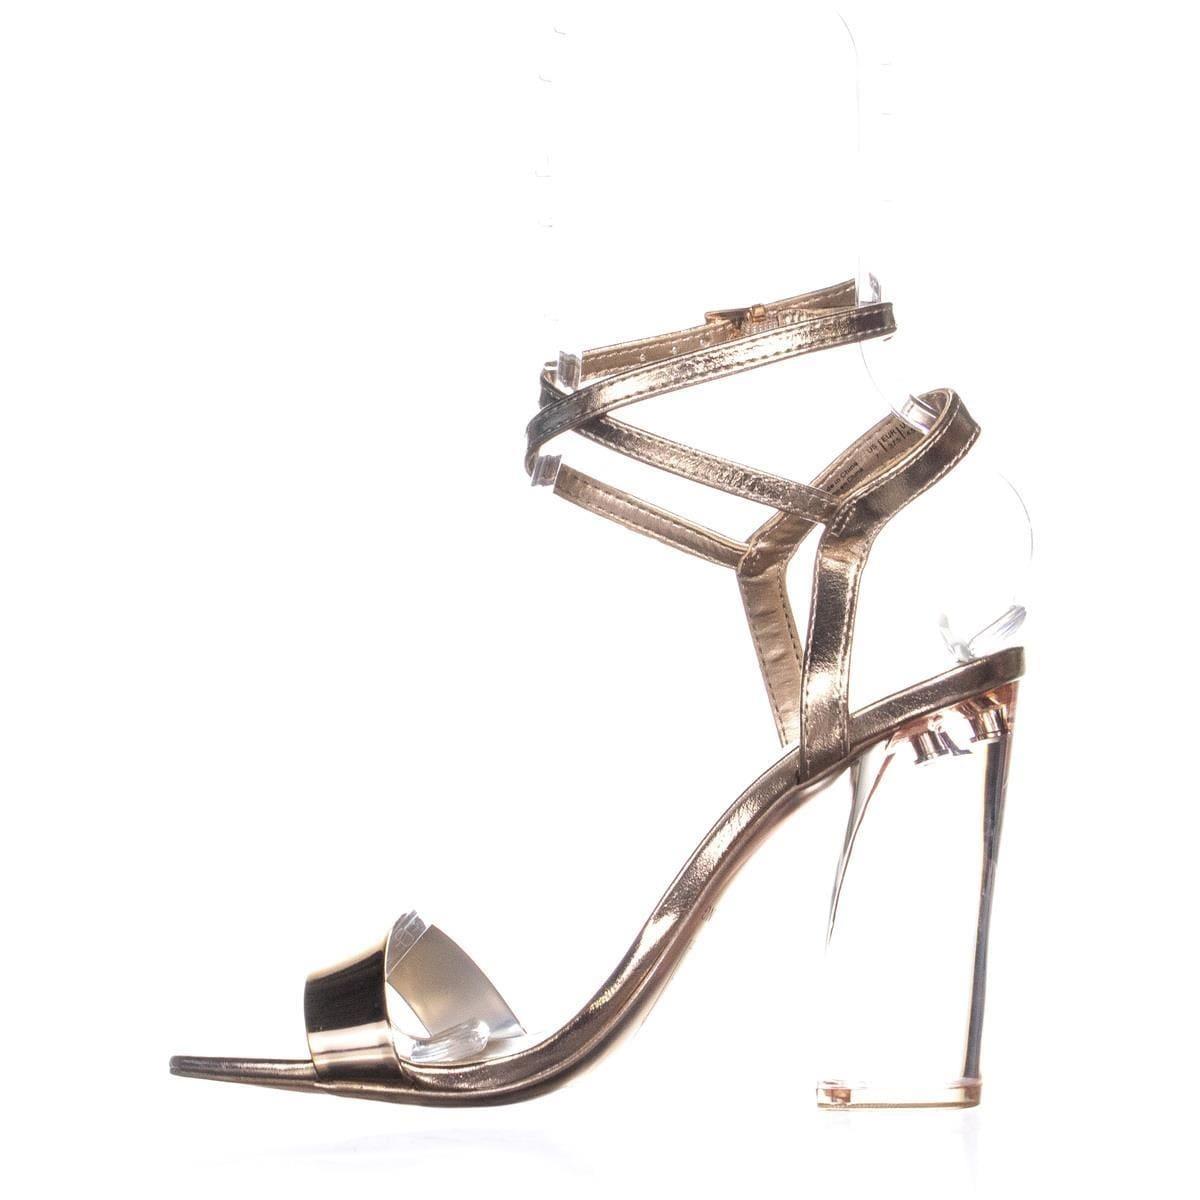 9e1b97c5458 Call It Spring Ocalide Ankle Strap Block Heel Sandals, Light Pink - 7 US /  37.5 EU